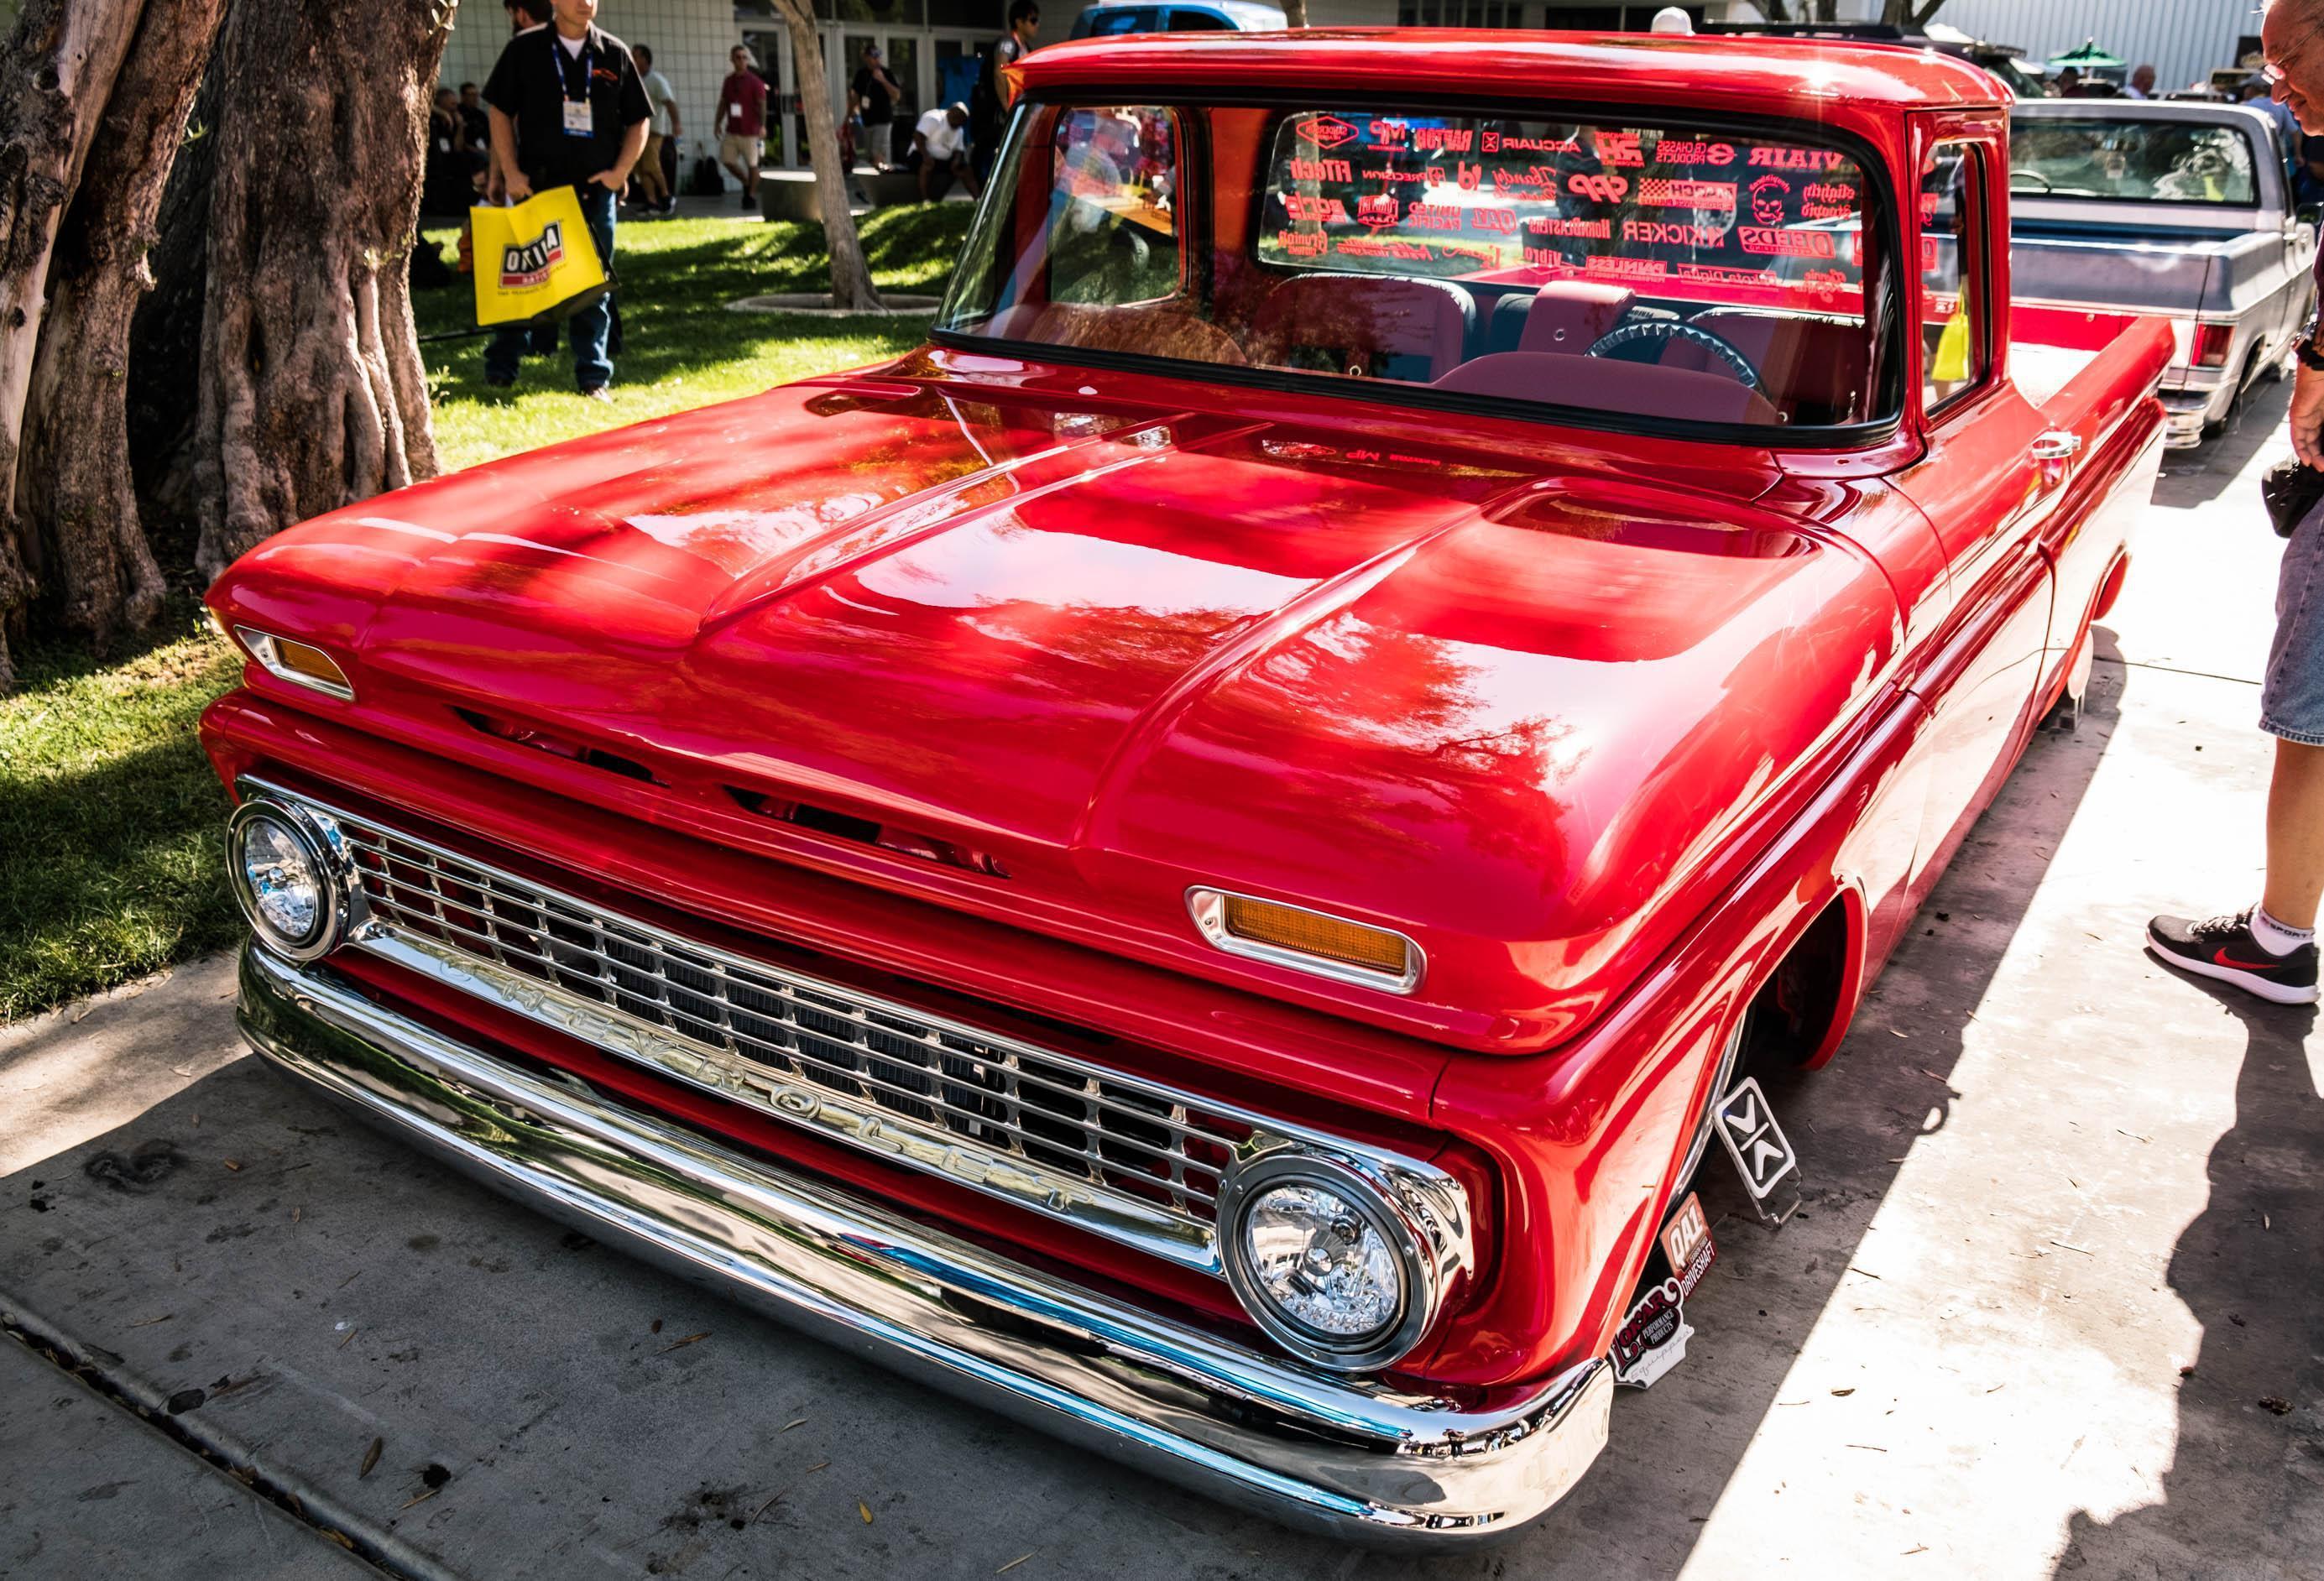 PHOTOS: The showstopping custom vintage trucks of SEMA 2017